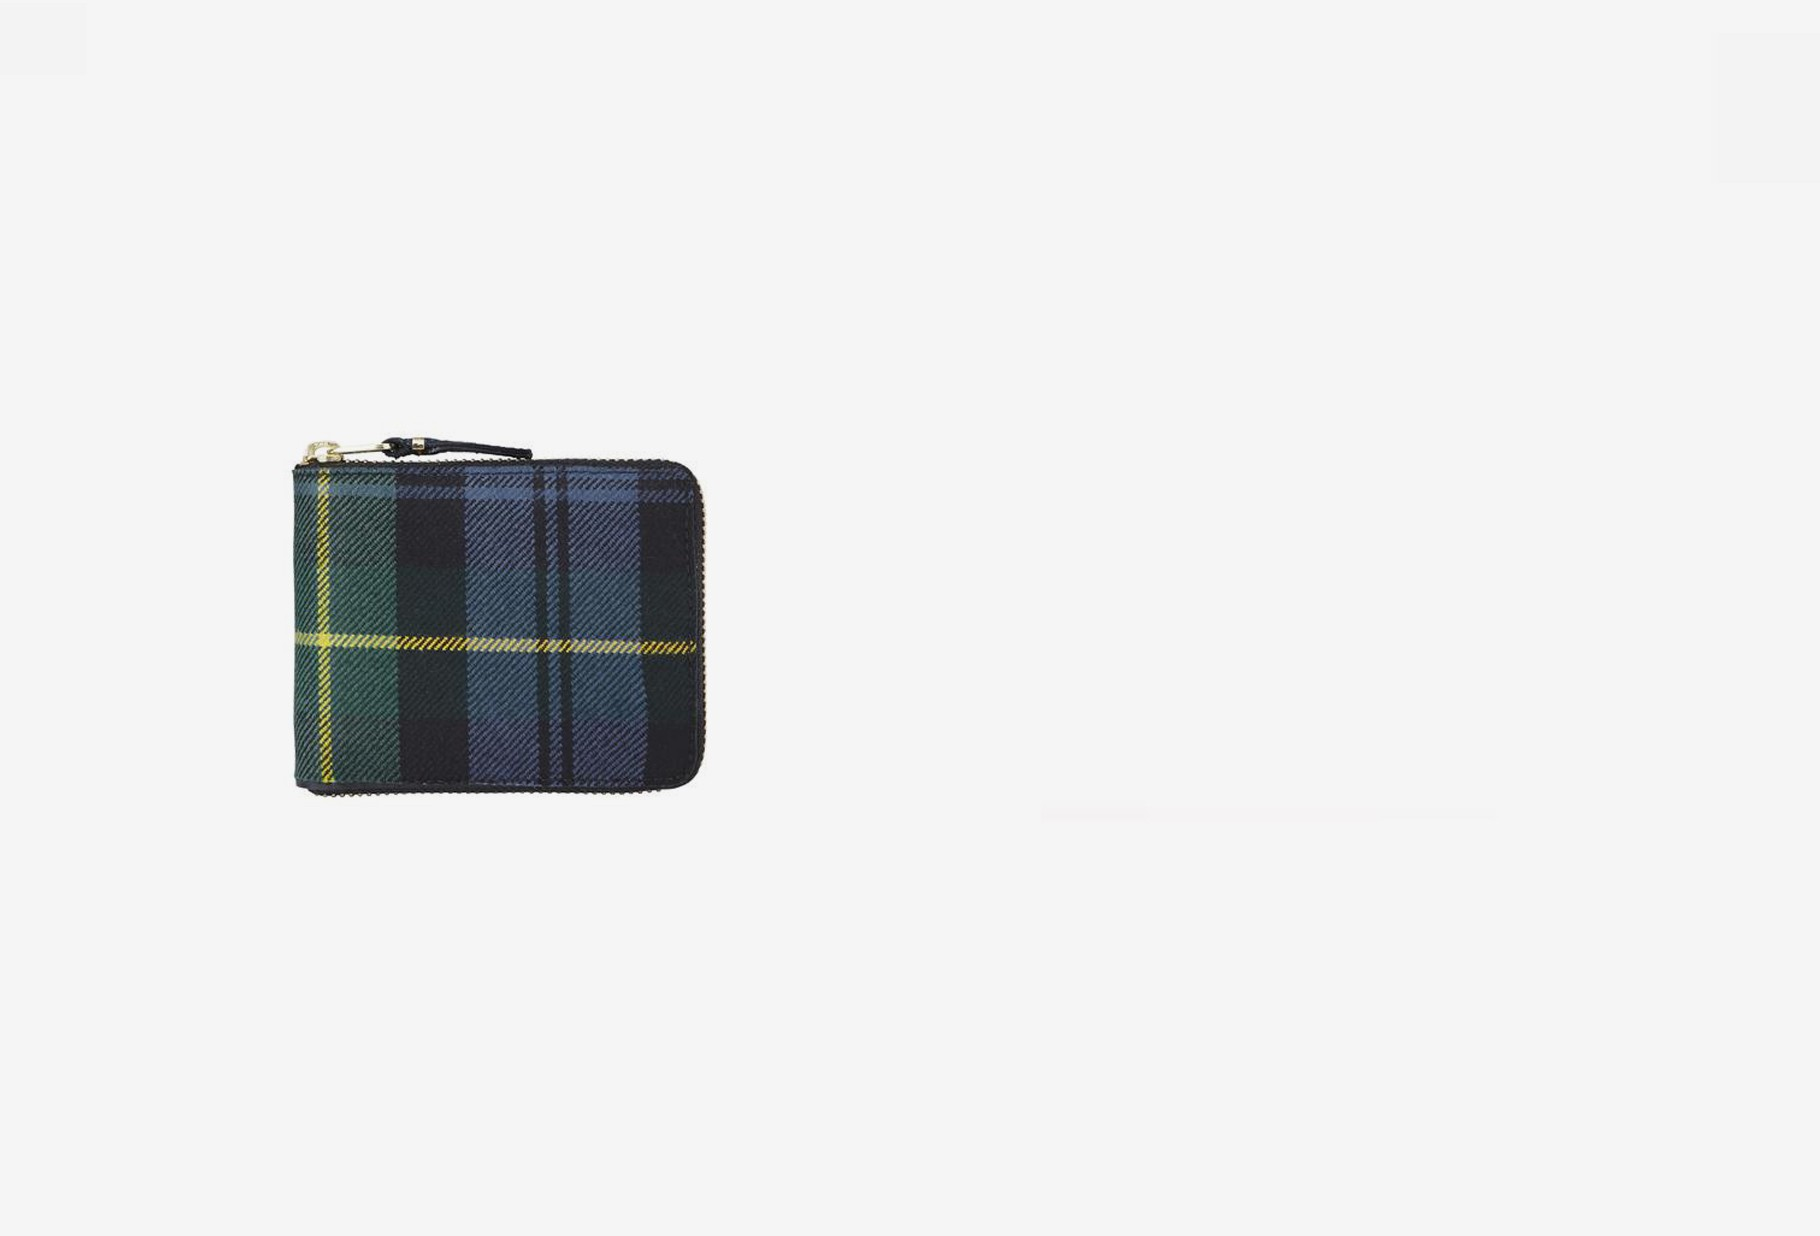 COMME DES GARÇONS WALLETS / Cdg wallet tartan patchwork Sa7100tp green